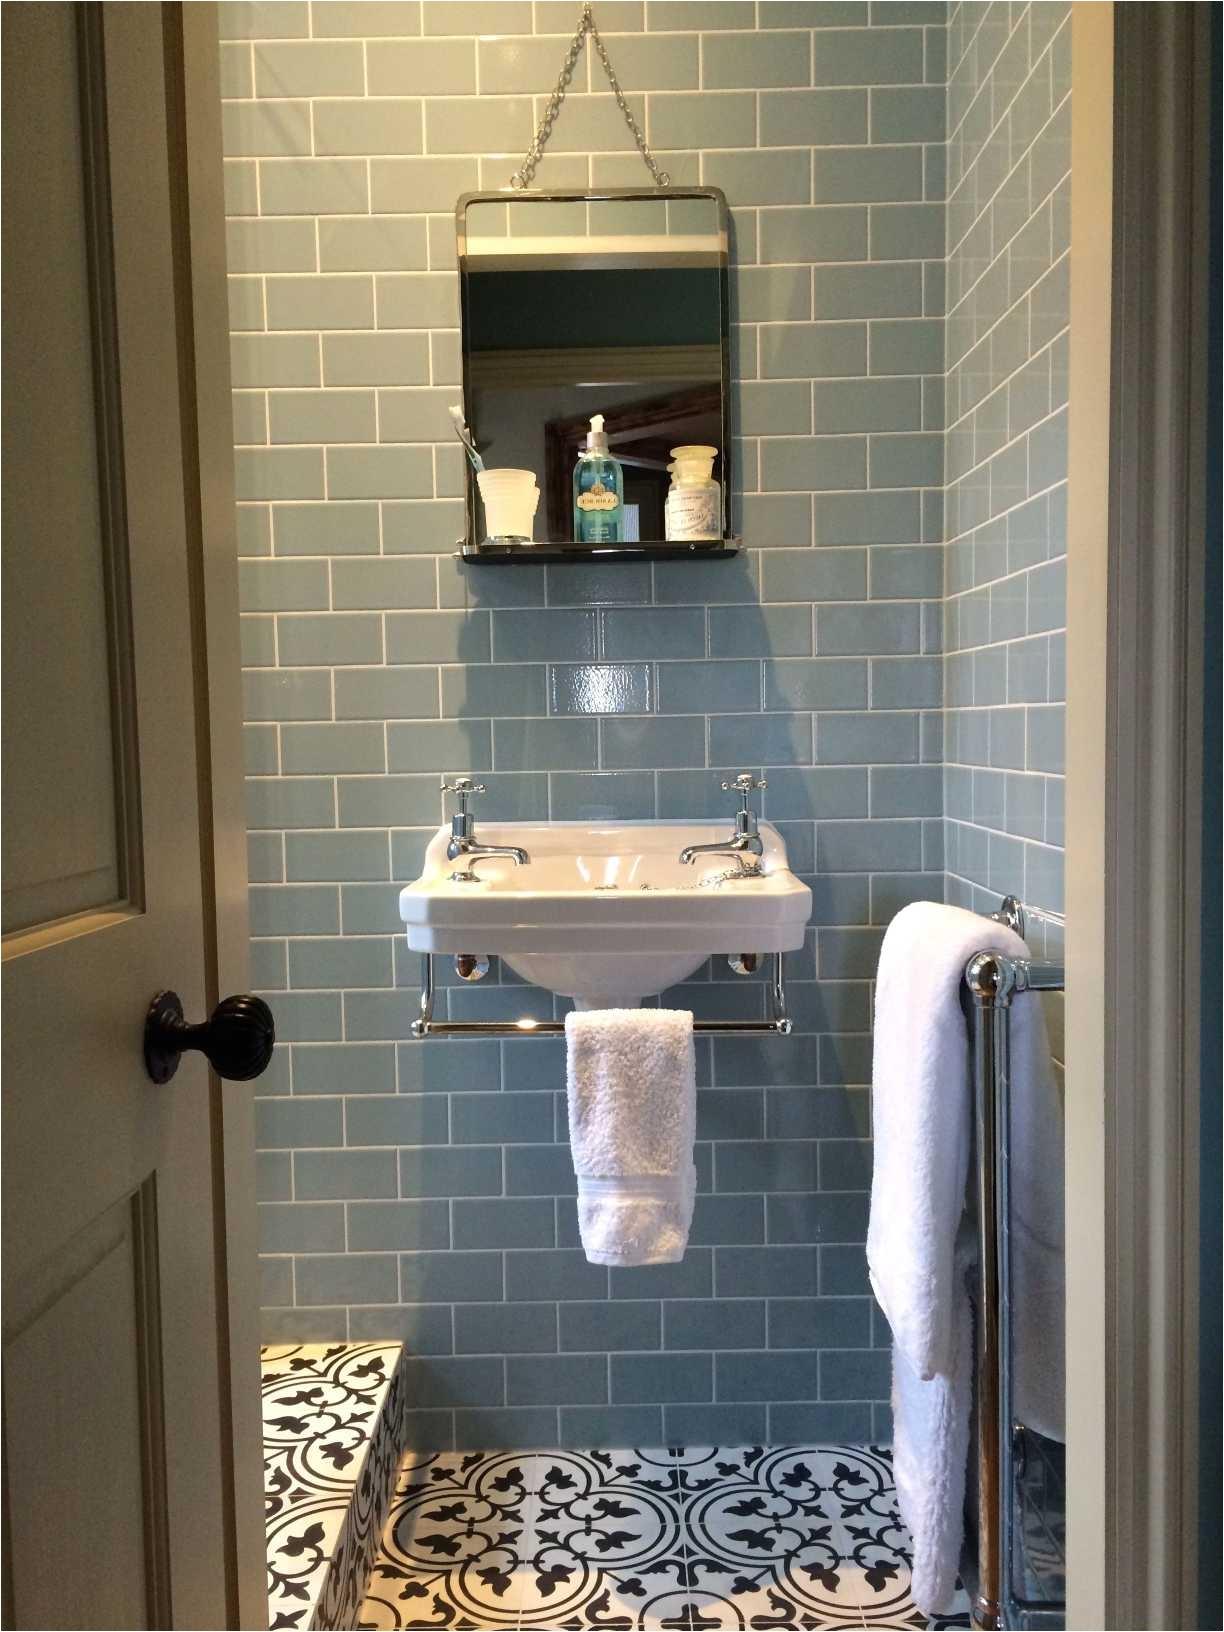 best bathtub faucet set h sink bathroom faucets repair i 0d cool of bathtub drain replacement